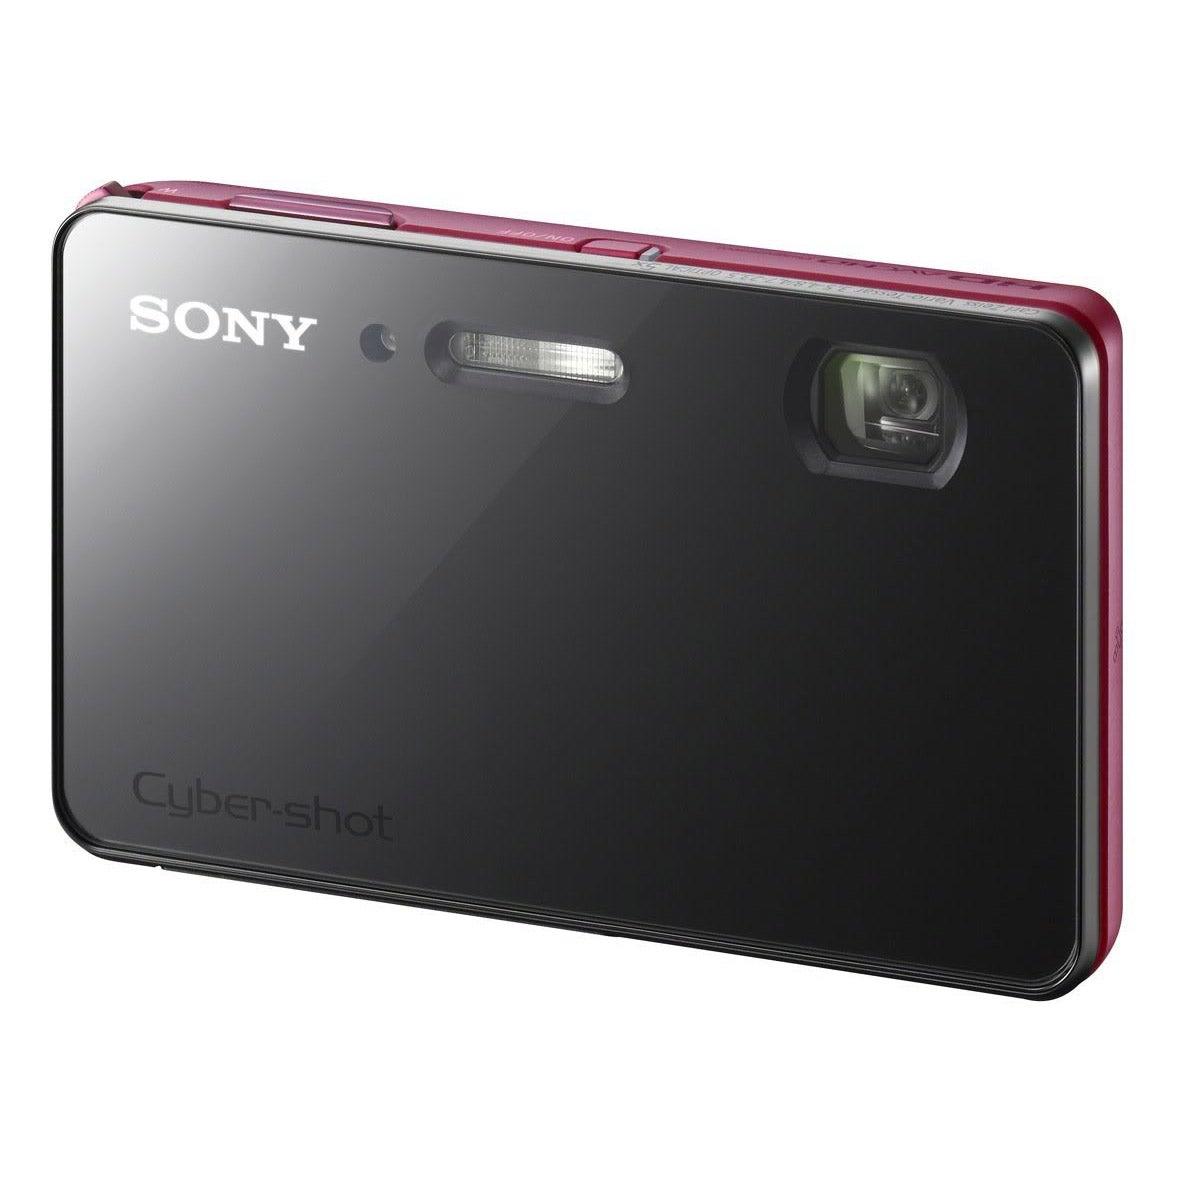 Sony Cyber-shot DSC-TX200V 18.2MP 3D Panorama Red Digital Camera